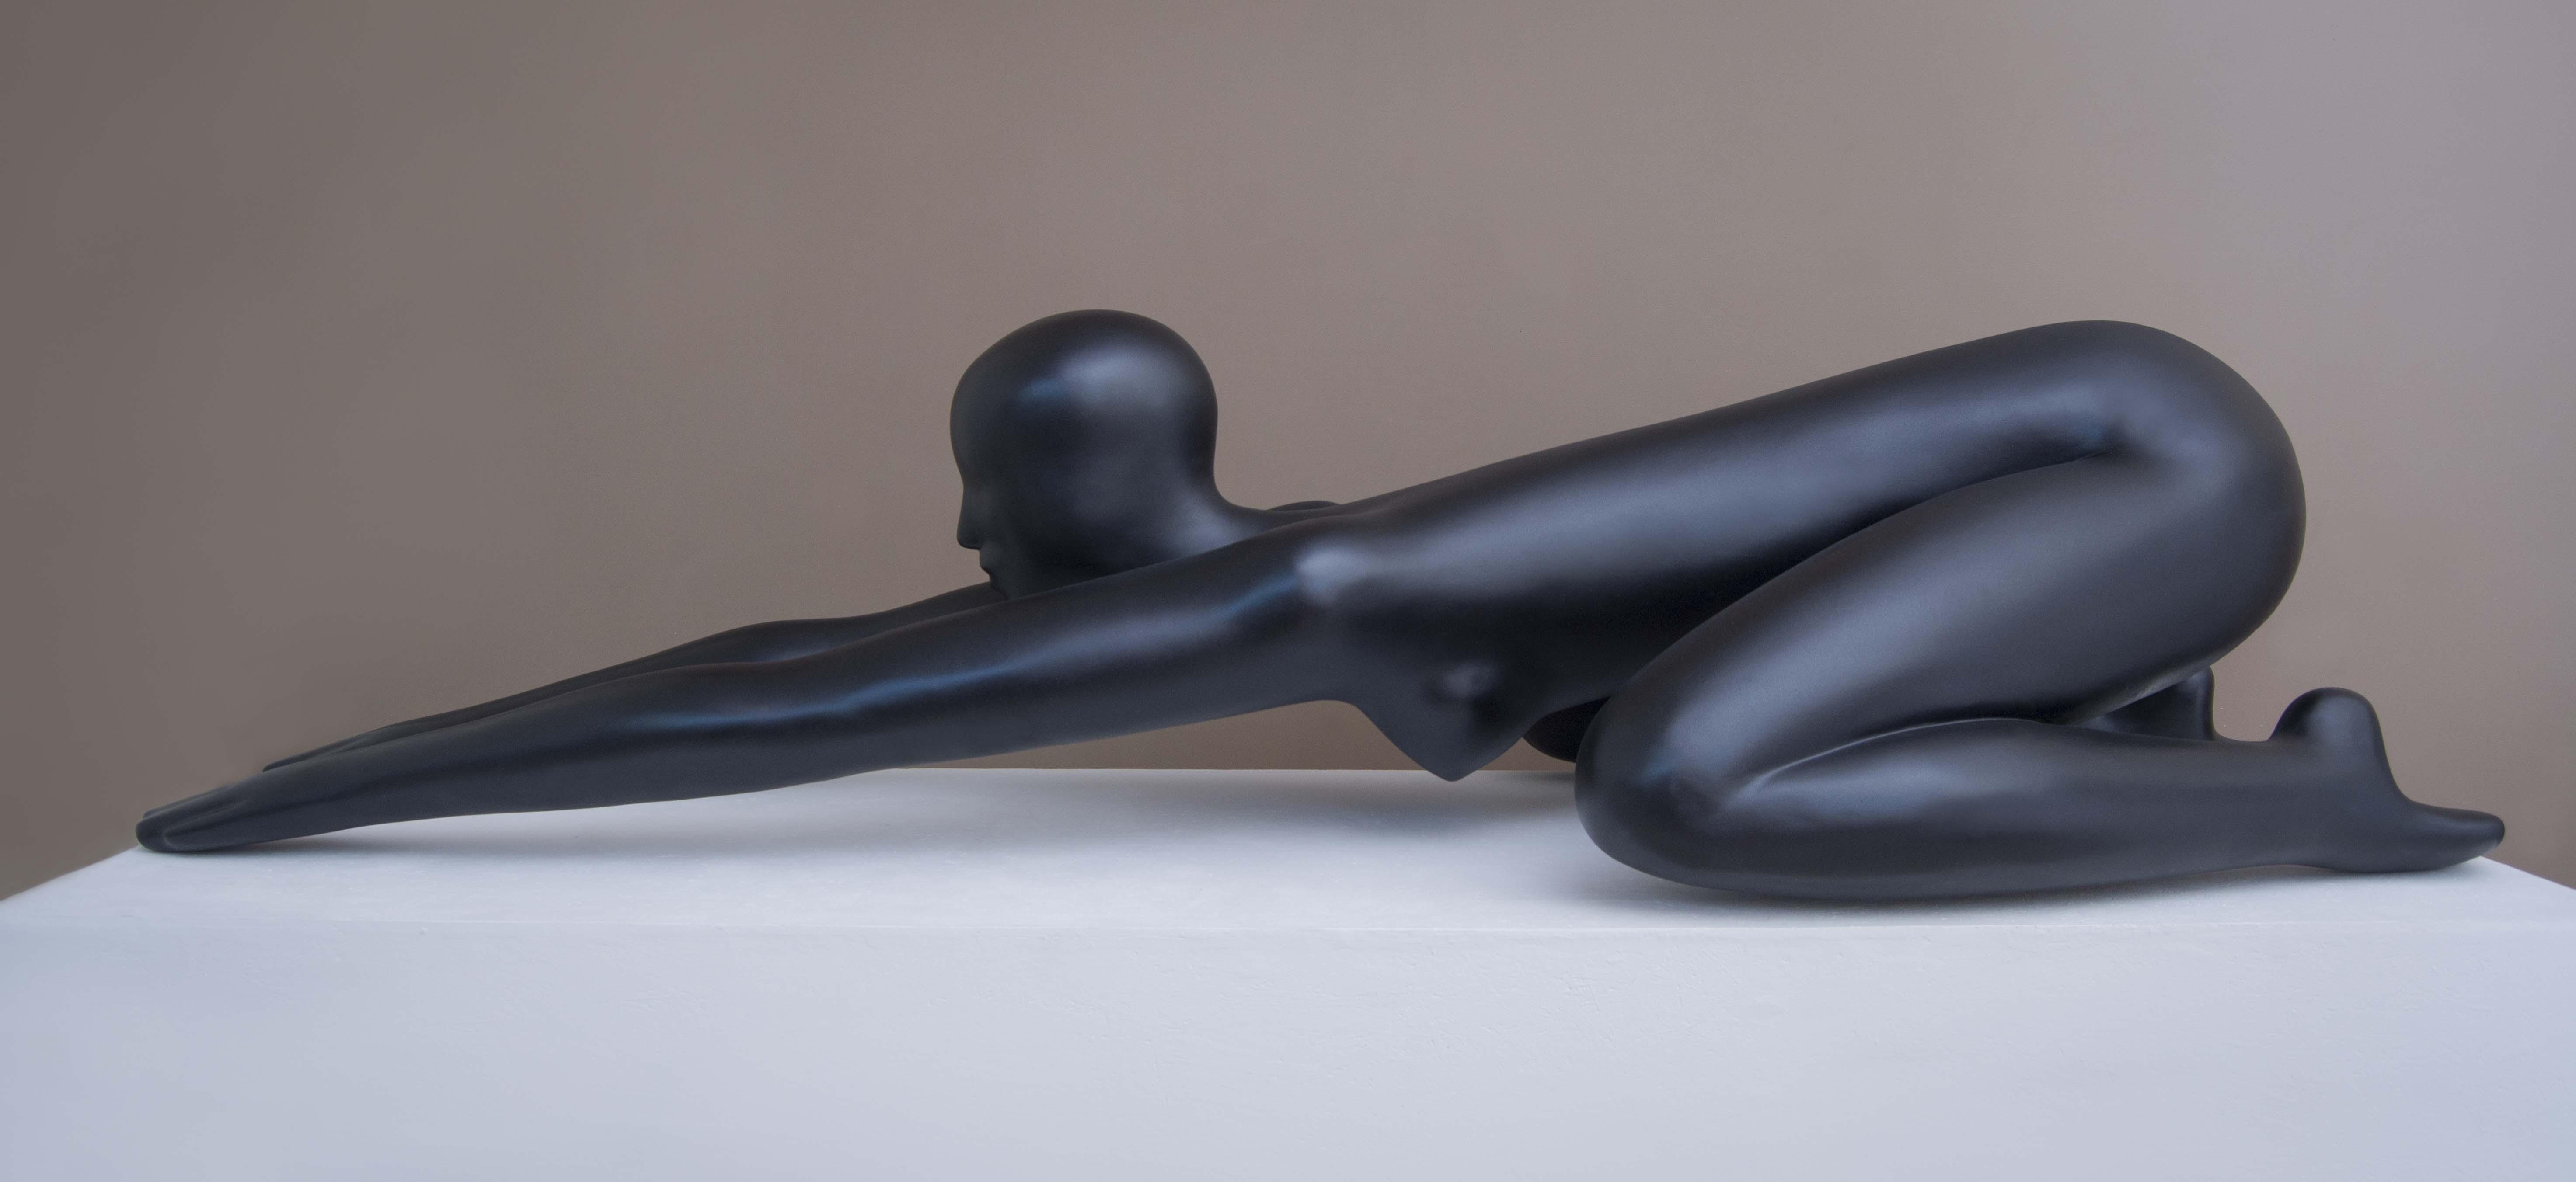 Серафим Чаркин, «Наложница», стеклопластик, 2014 год.